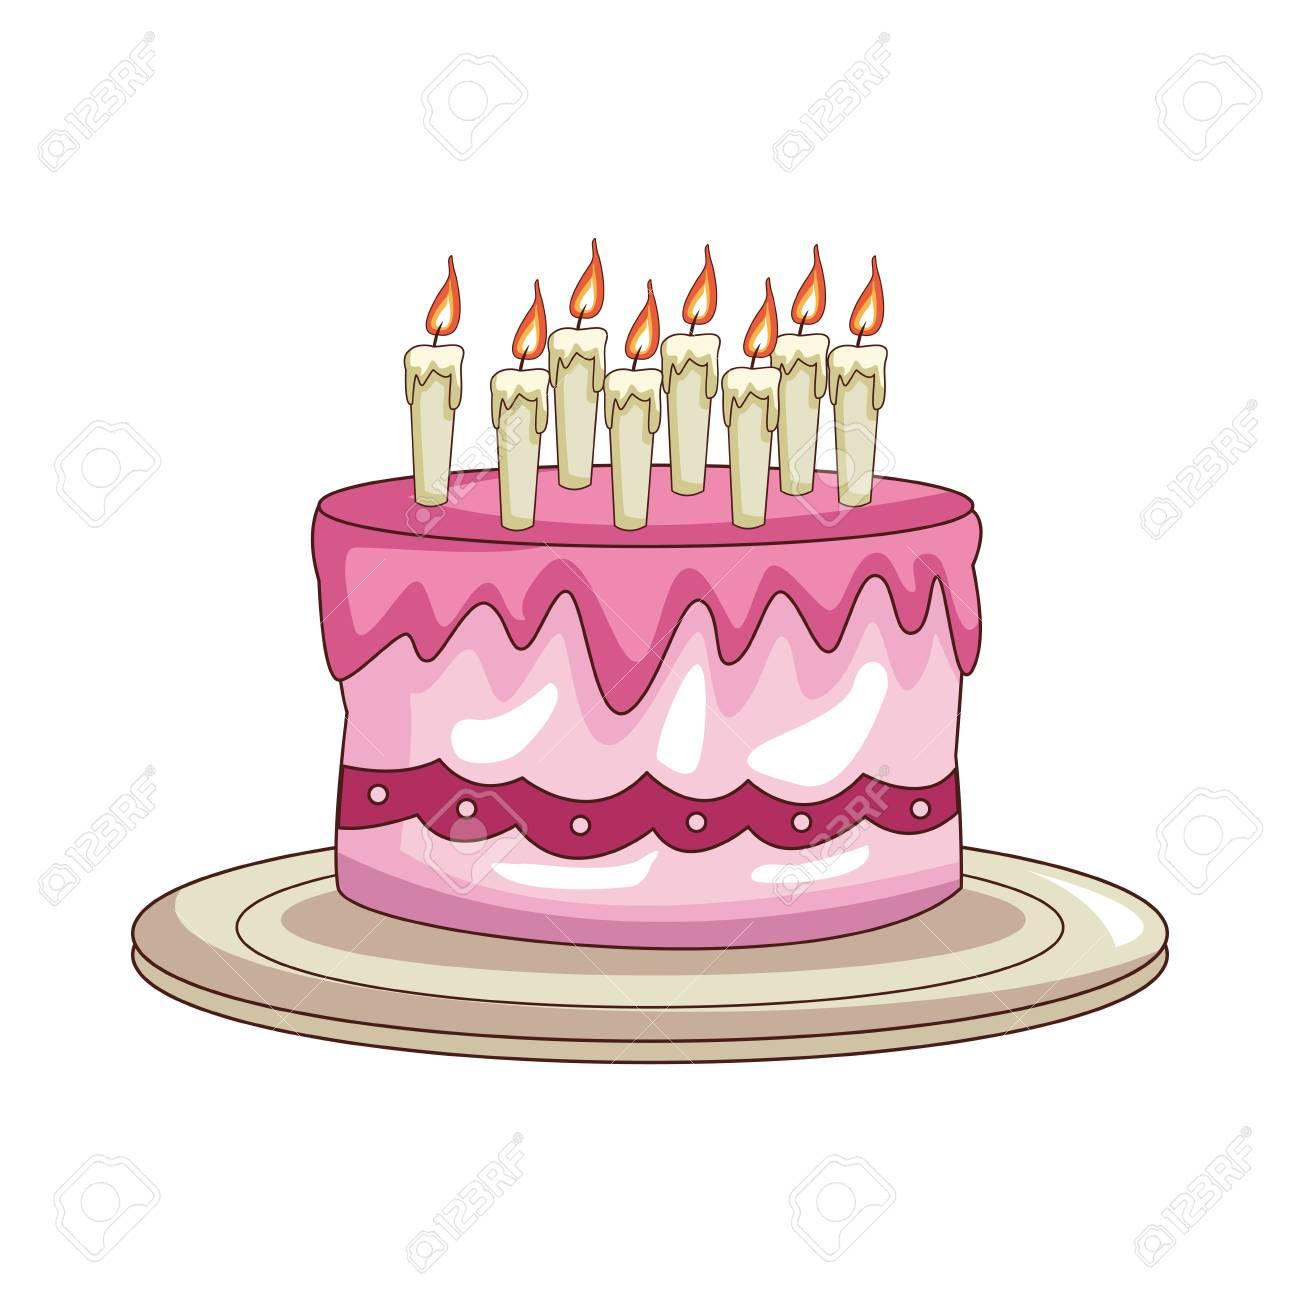 Birthday Cake Cartoon Vector Illustration Graphic Design Stock